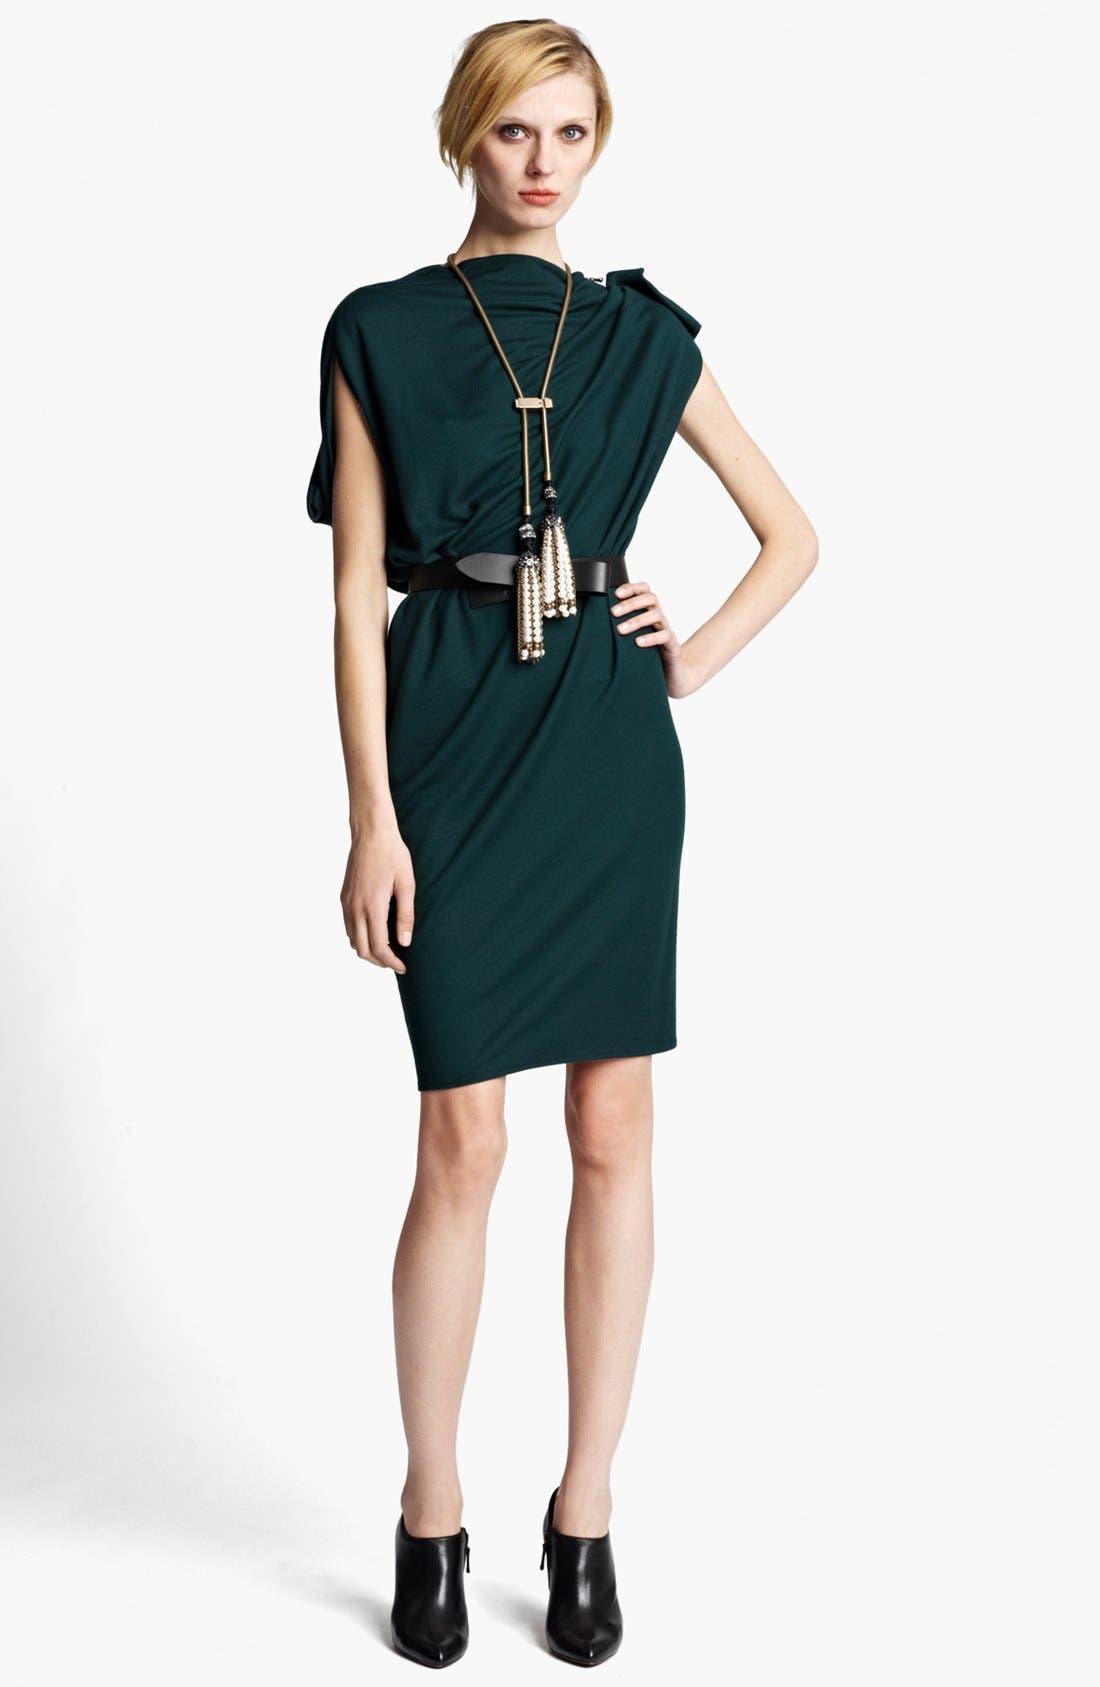 Alternate Image 1 Selected - Lanvin Dress & Accessories